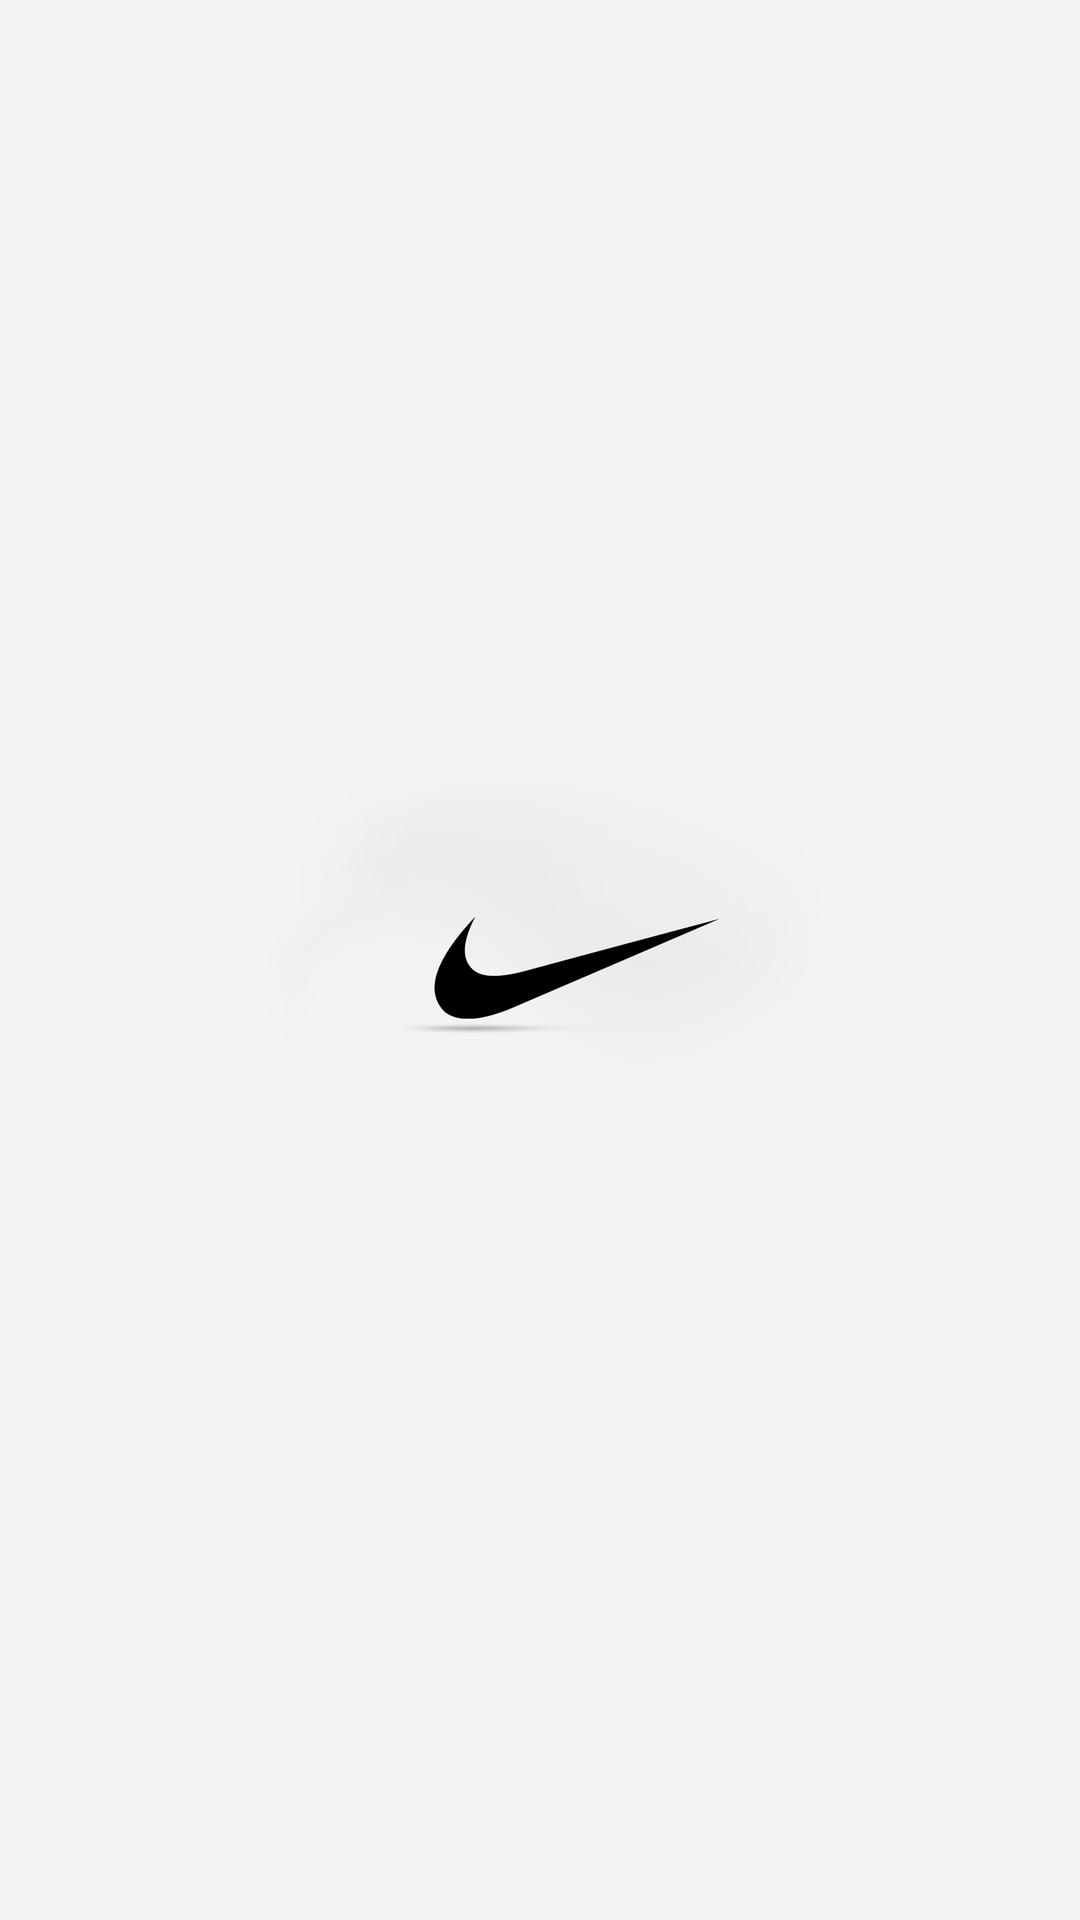 Wallpaper iphone nike - Wallpaper Nike Photos Of Nike Iphone Wallpaper By Free Hd Wallpapers